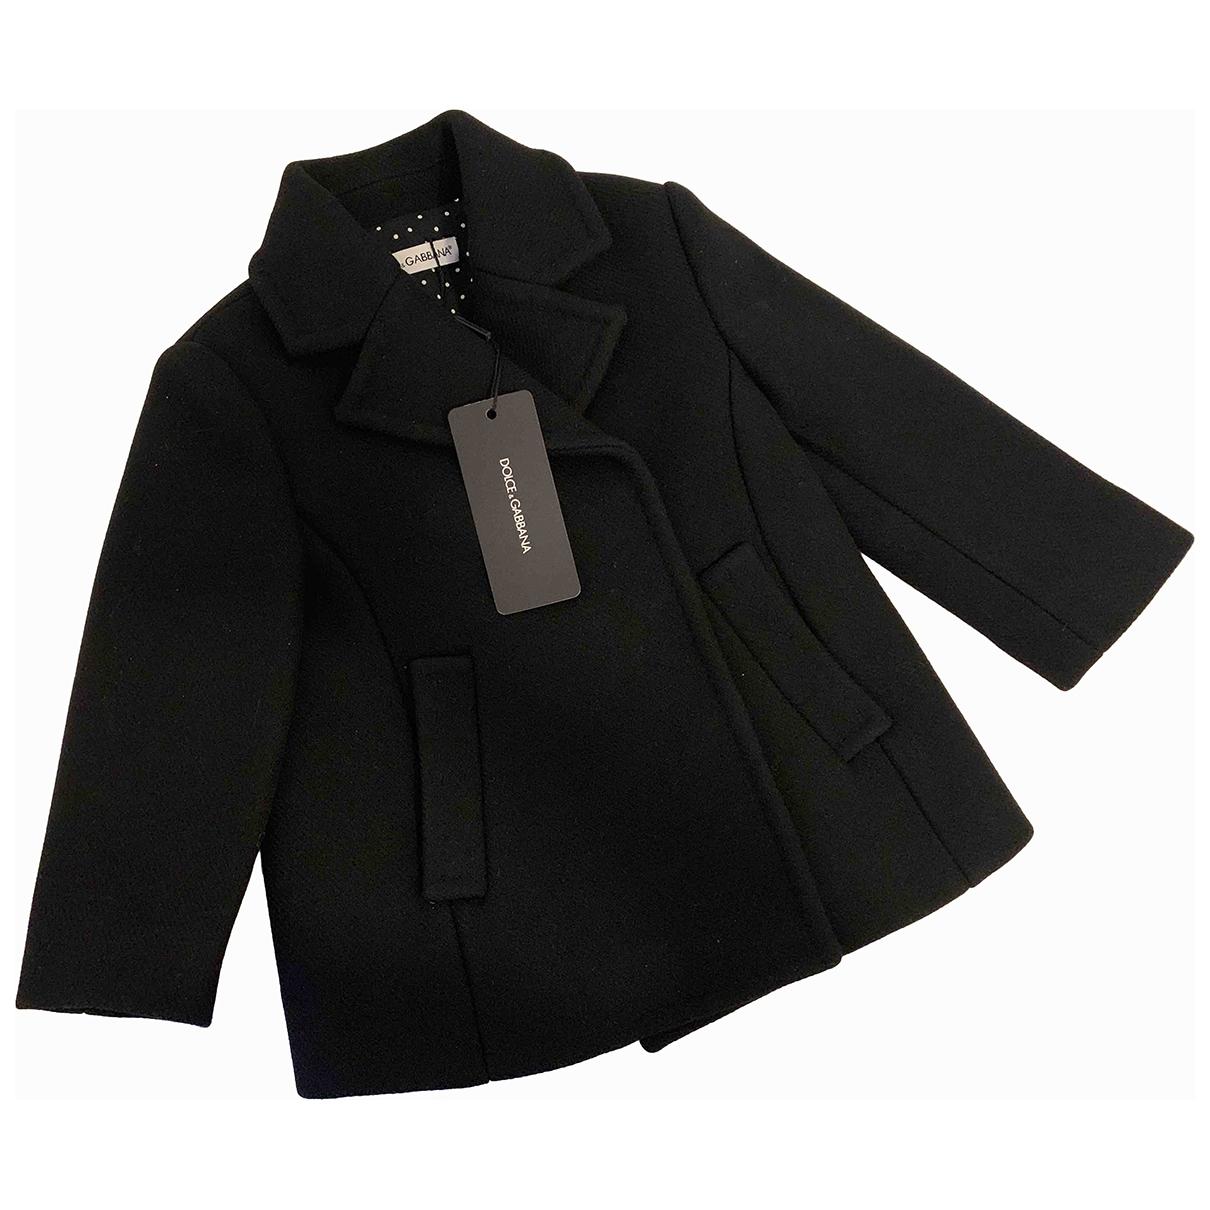 Dolce & Gabbana \N Jacke, Maentel in  Schwarz Wolle